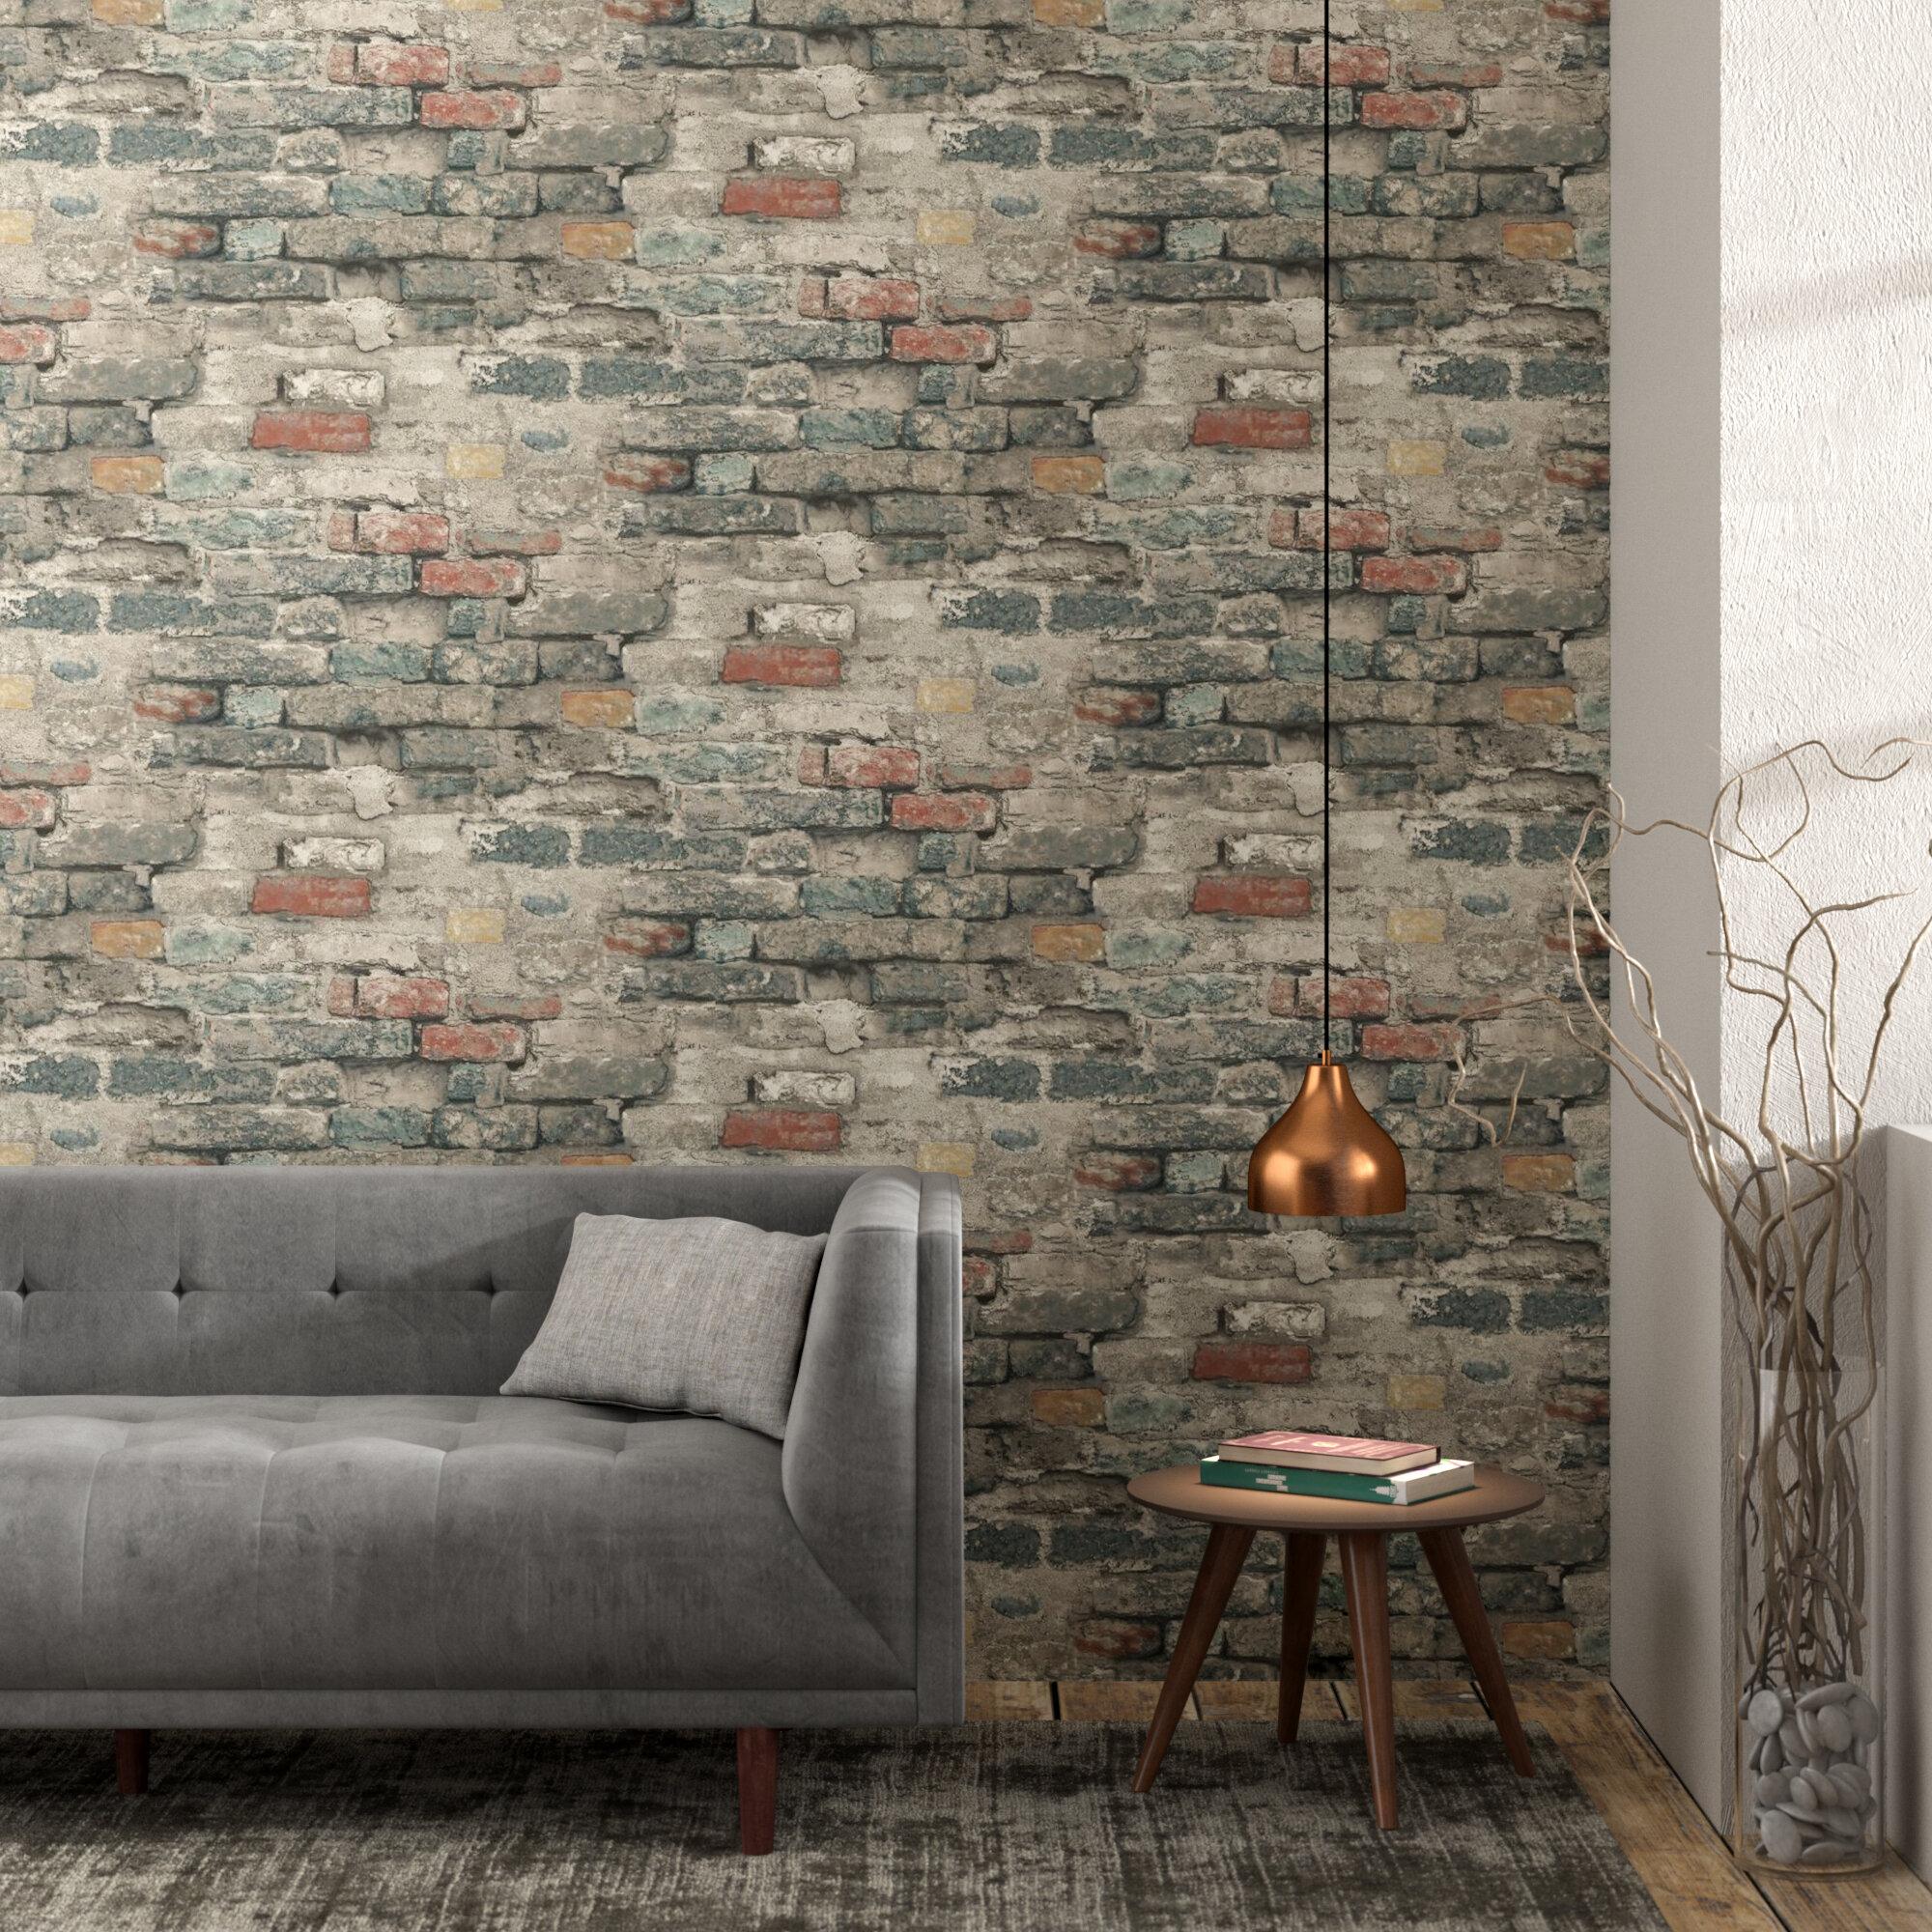 Williston Forge Crigler 16 5 L X 20 W Brick Alley And Stick Wallpaper Roll Reviews Wayfair